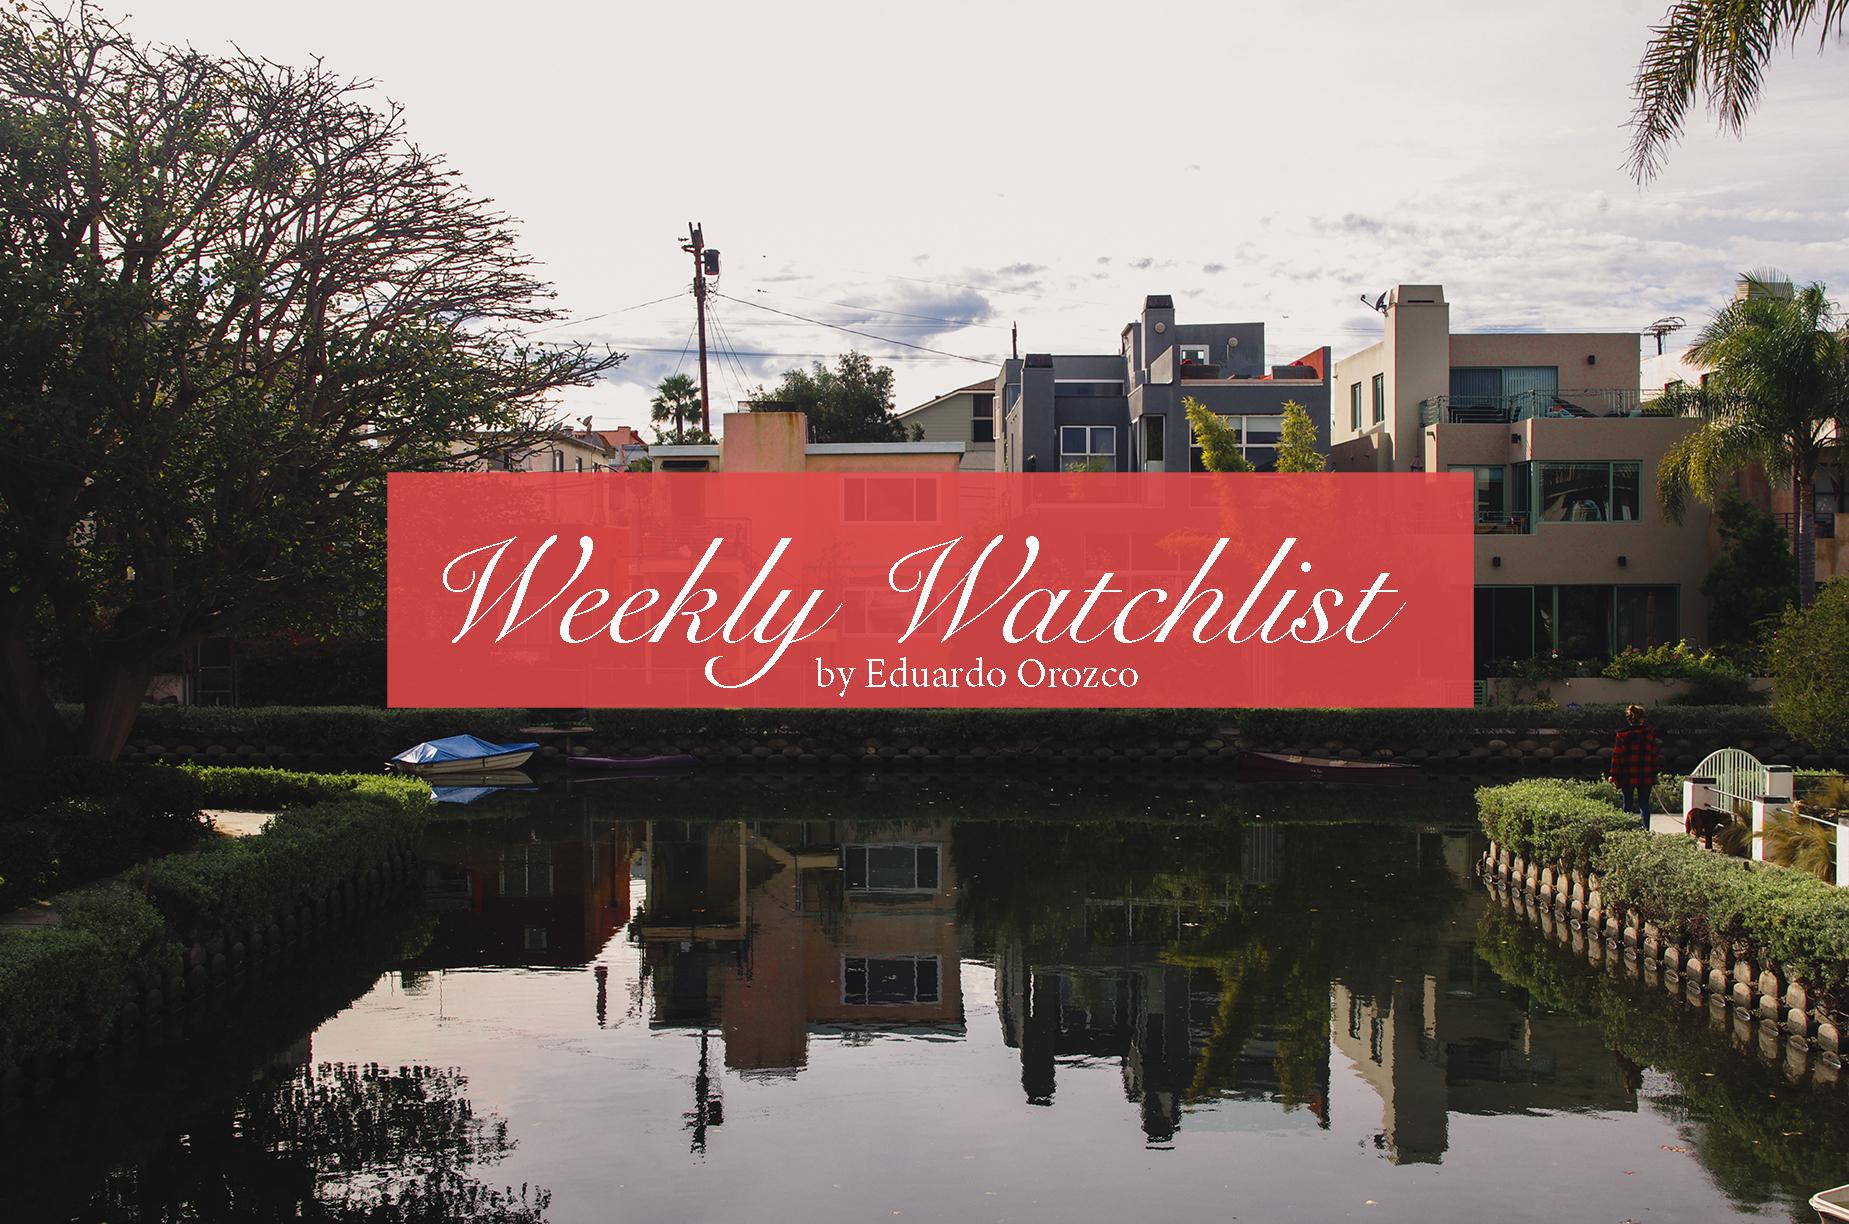 weekly watchlist